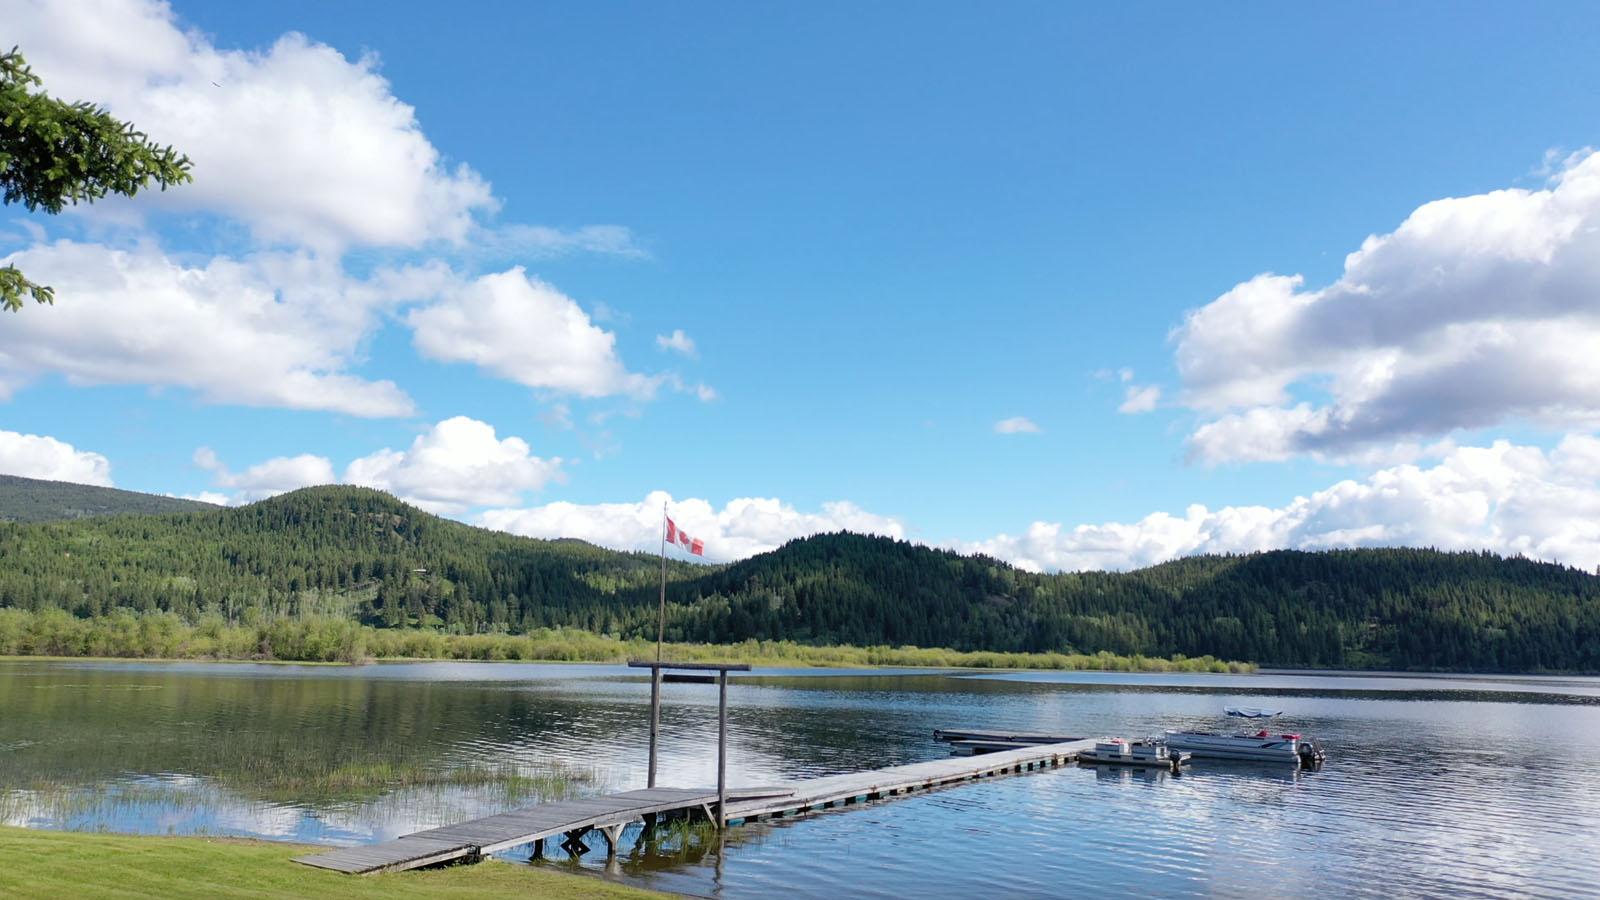 Canim lake resort 14